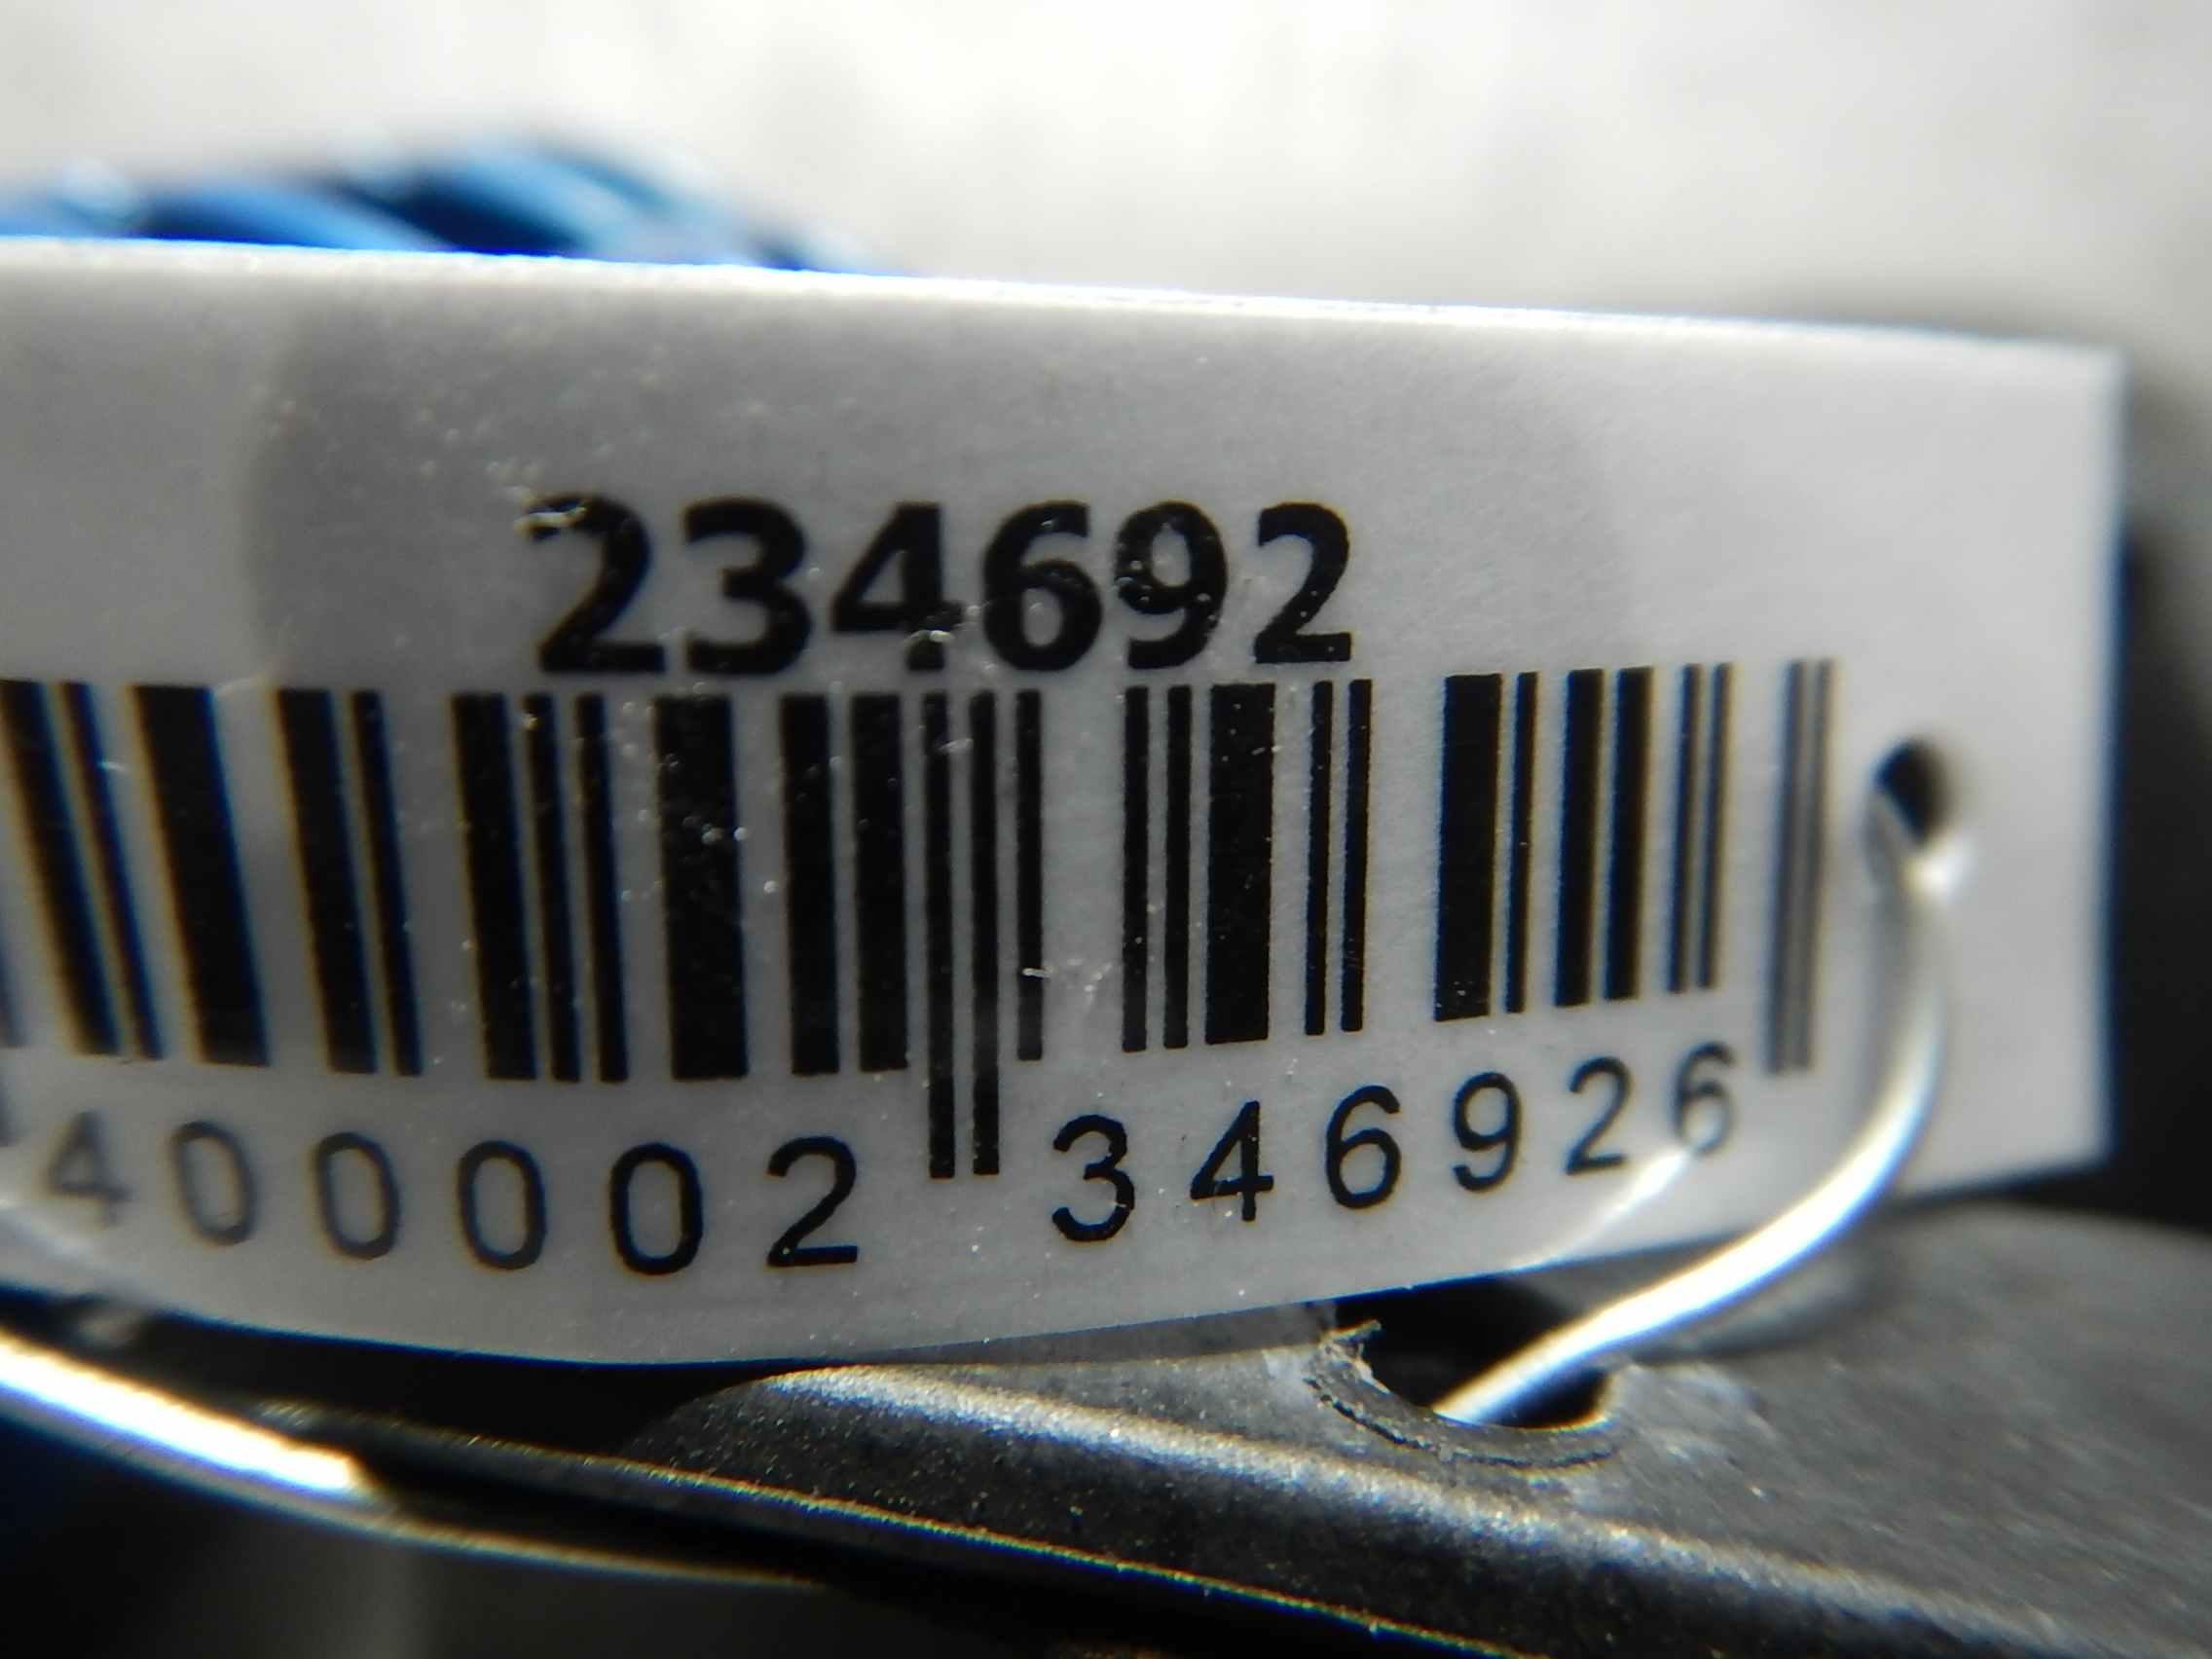 Лючок бензобака Opel Tigra 2 234692 preview-4